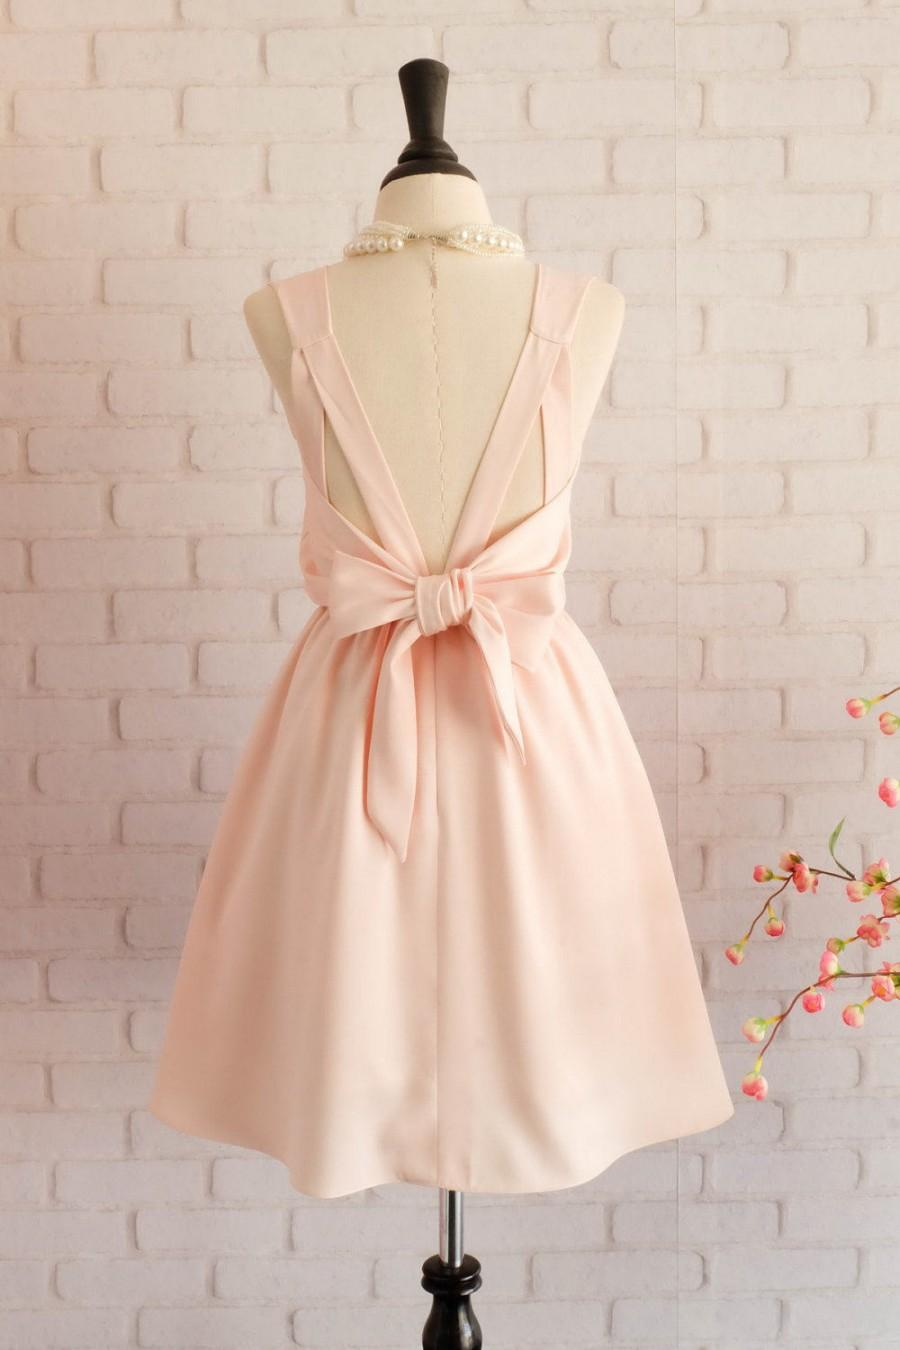 Mariage - Blush pink Dress Pink Bridesmaid dress Wedding Prom dress Cocktail Party dress Evening dress Backless bow dress